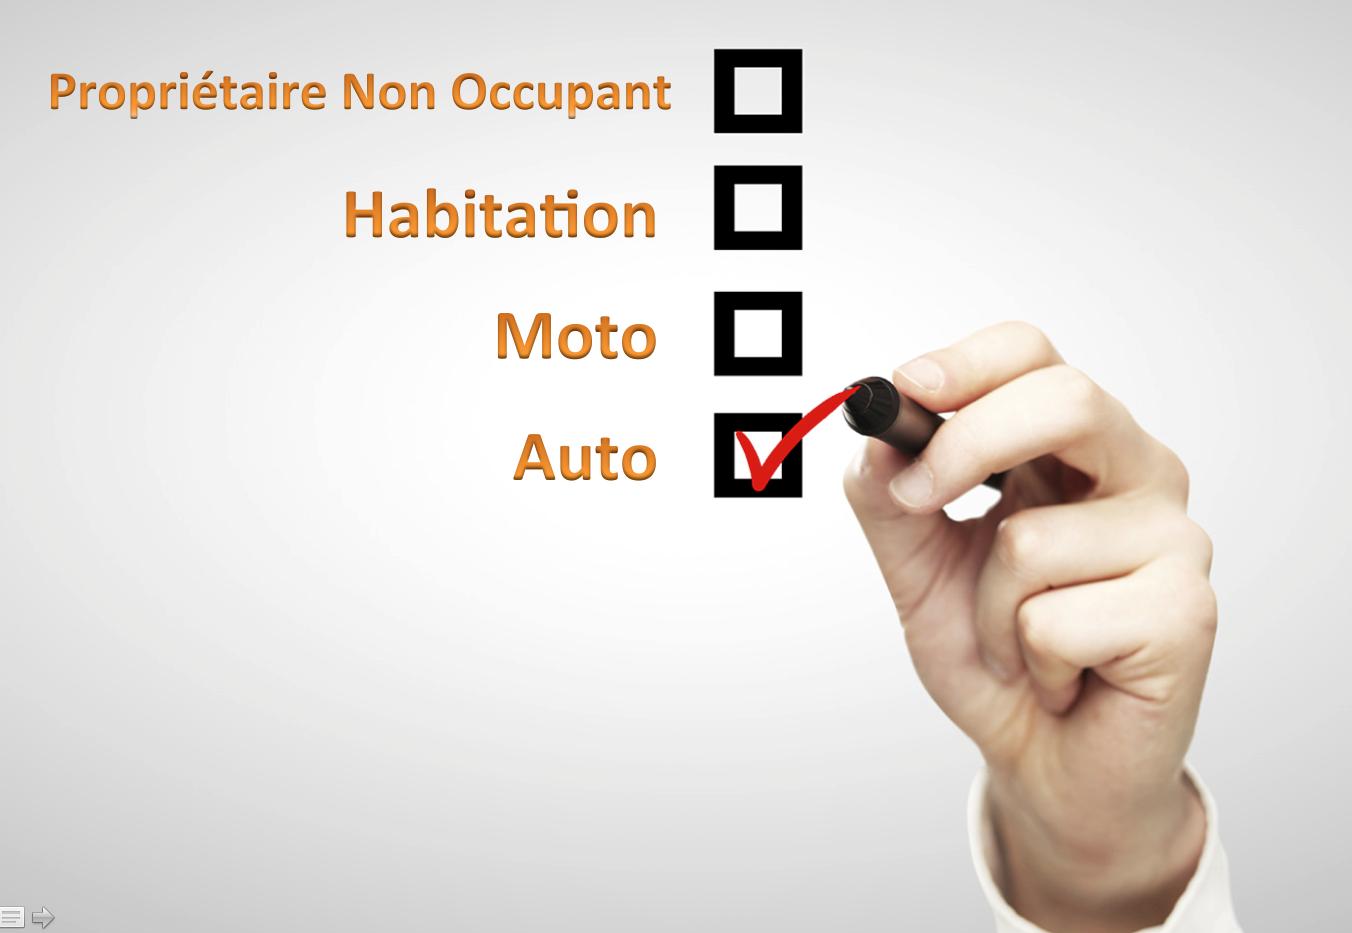 Assurances séniors AXA Auto habitation moto PNO